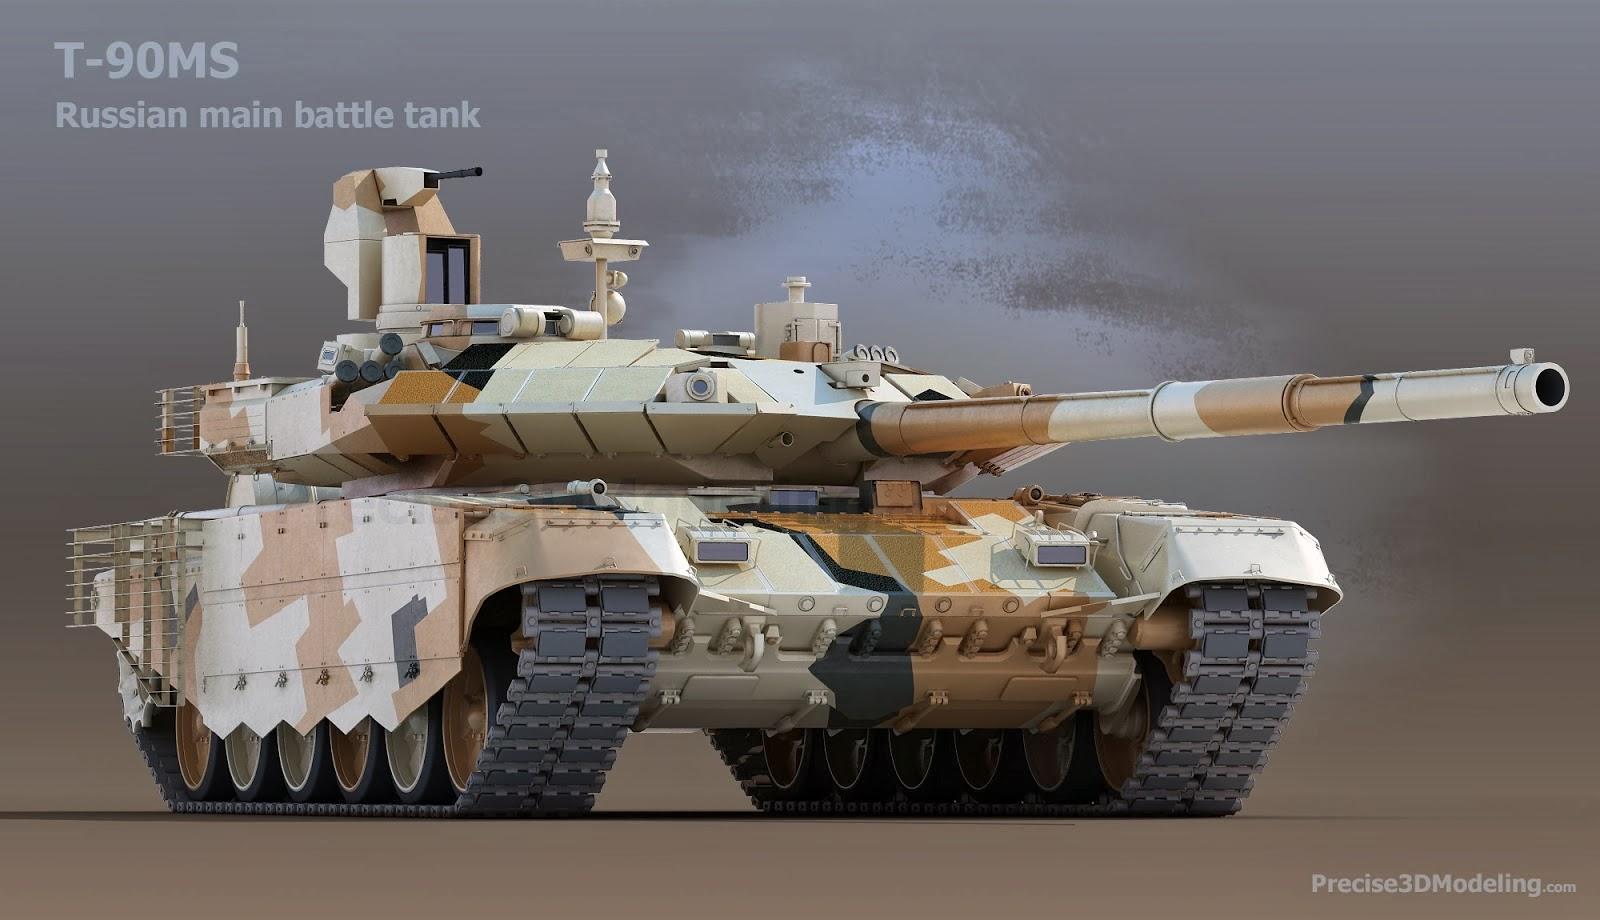 T-90MS_02_large.jpg